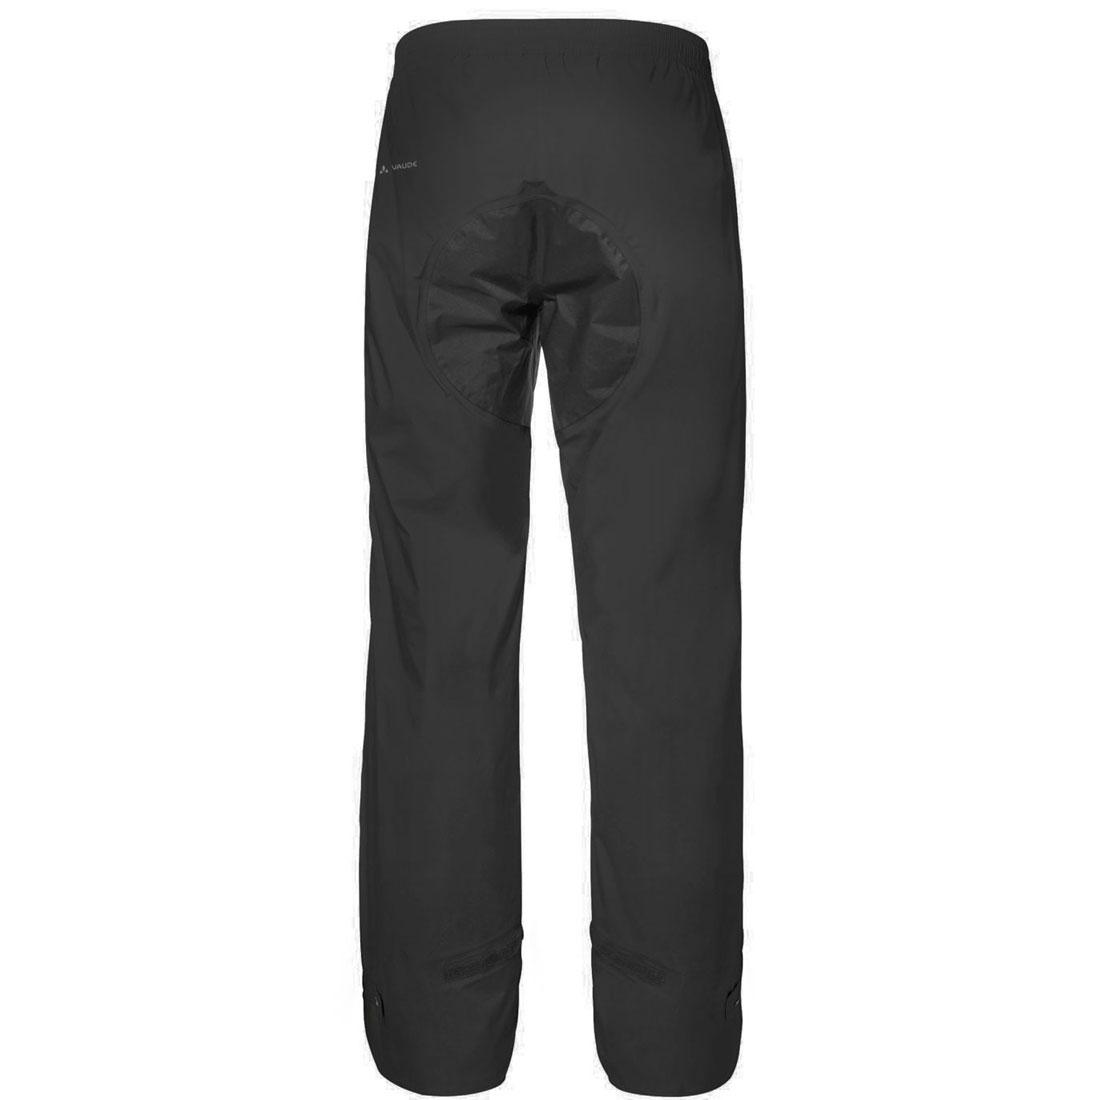 Bild von Vaude Drop II Regenhose - Long - schwarz uni